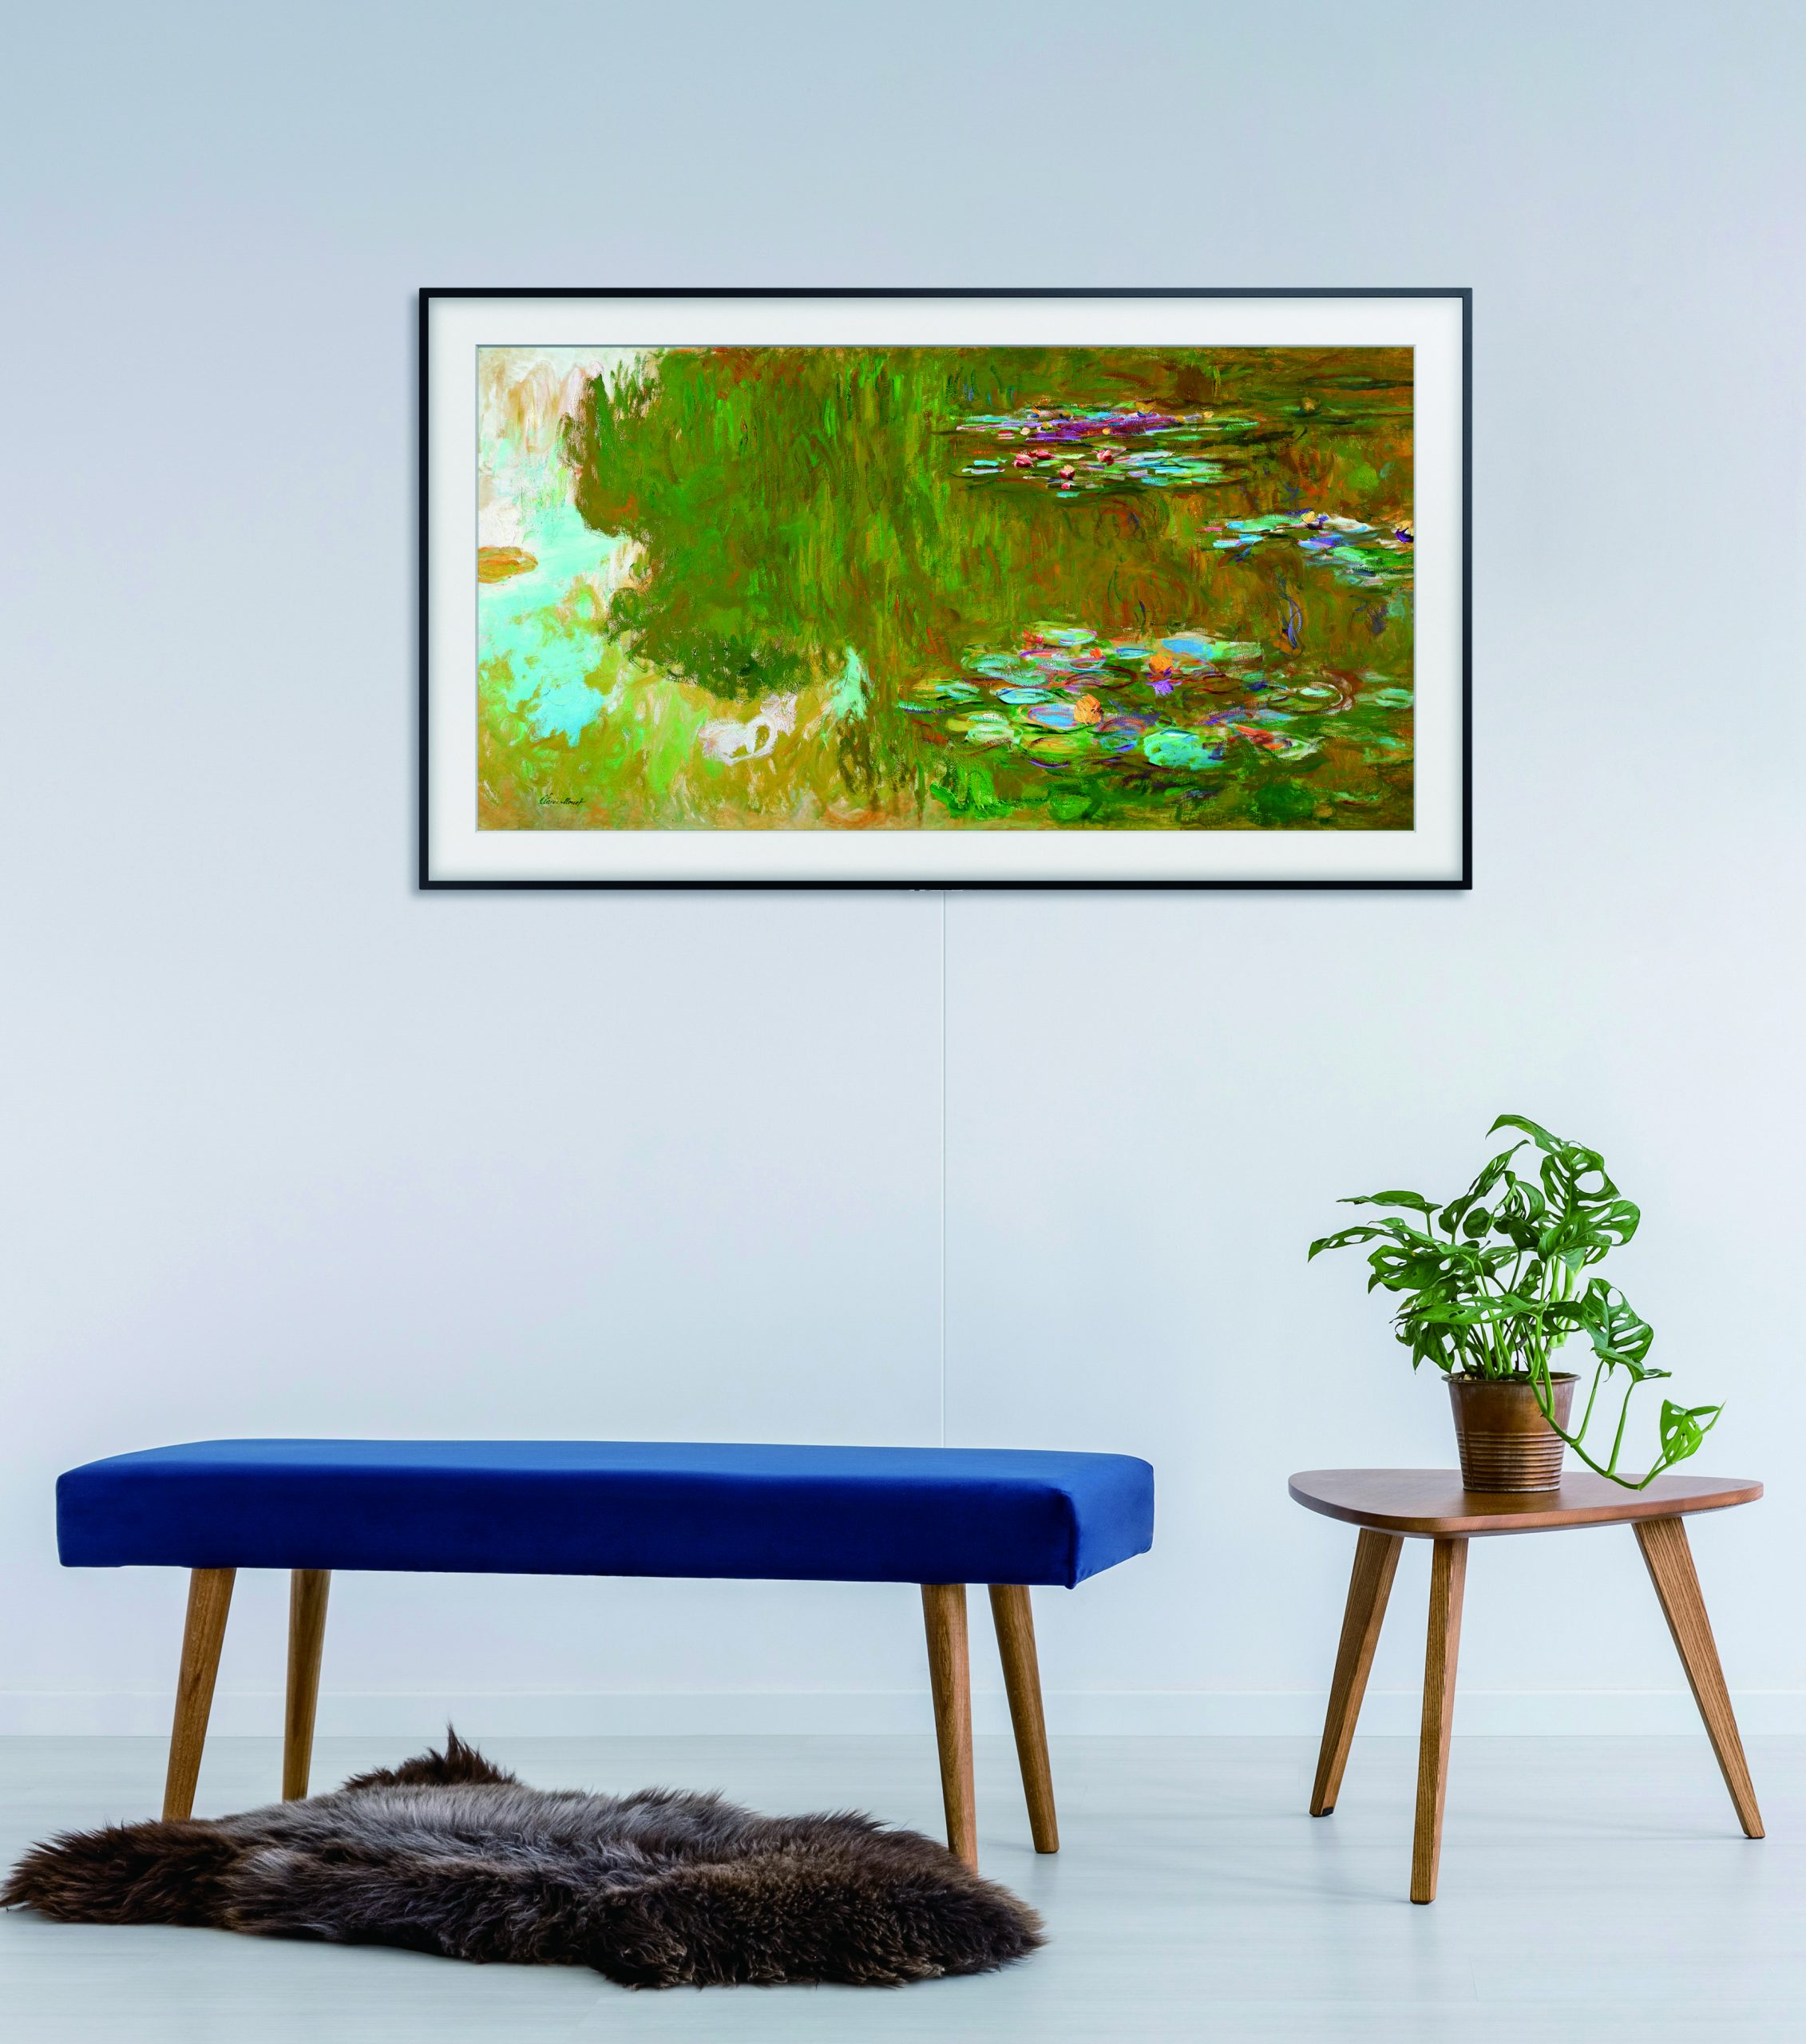 Aukcja Nowej Sztuki